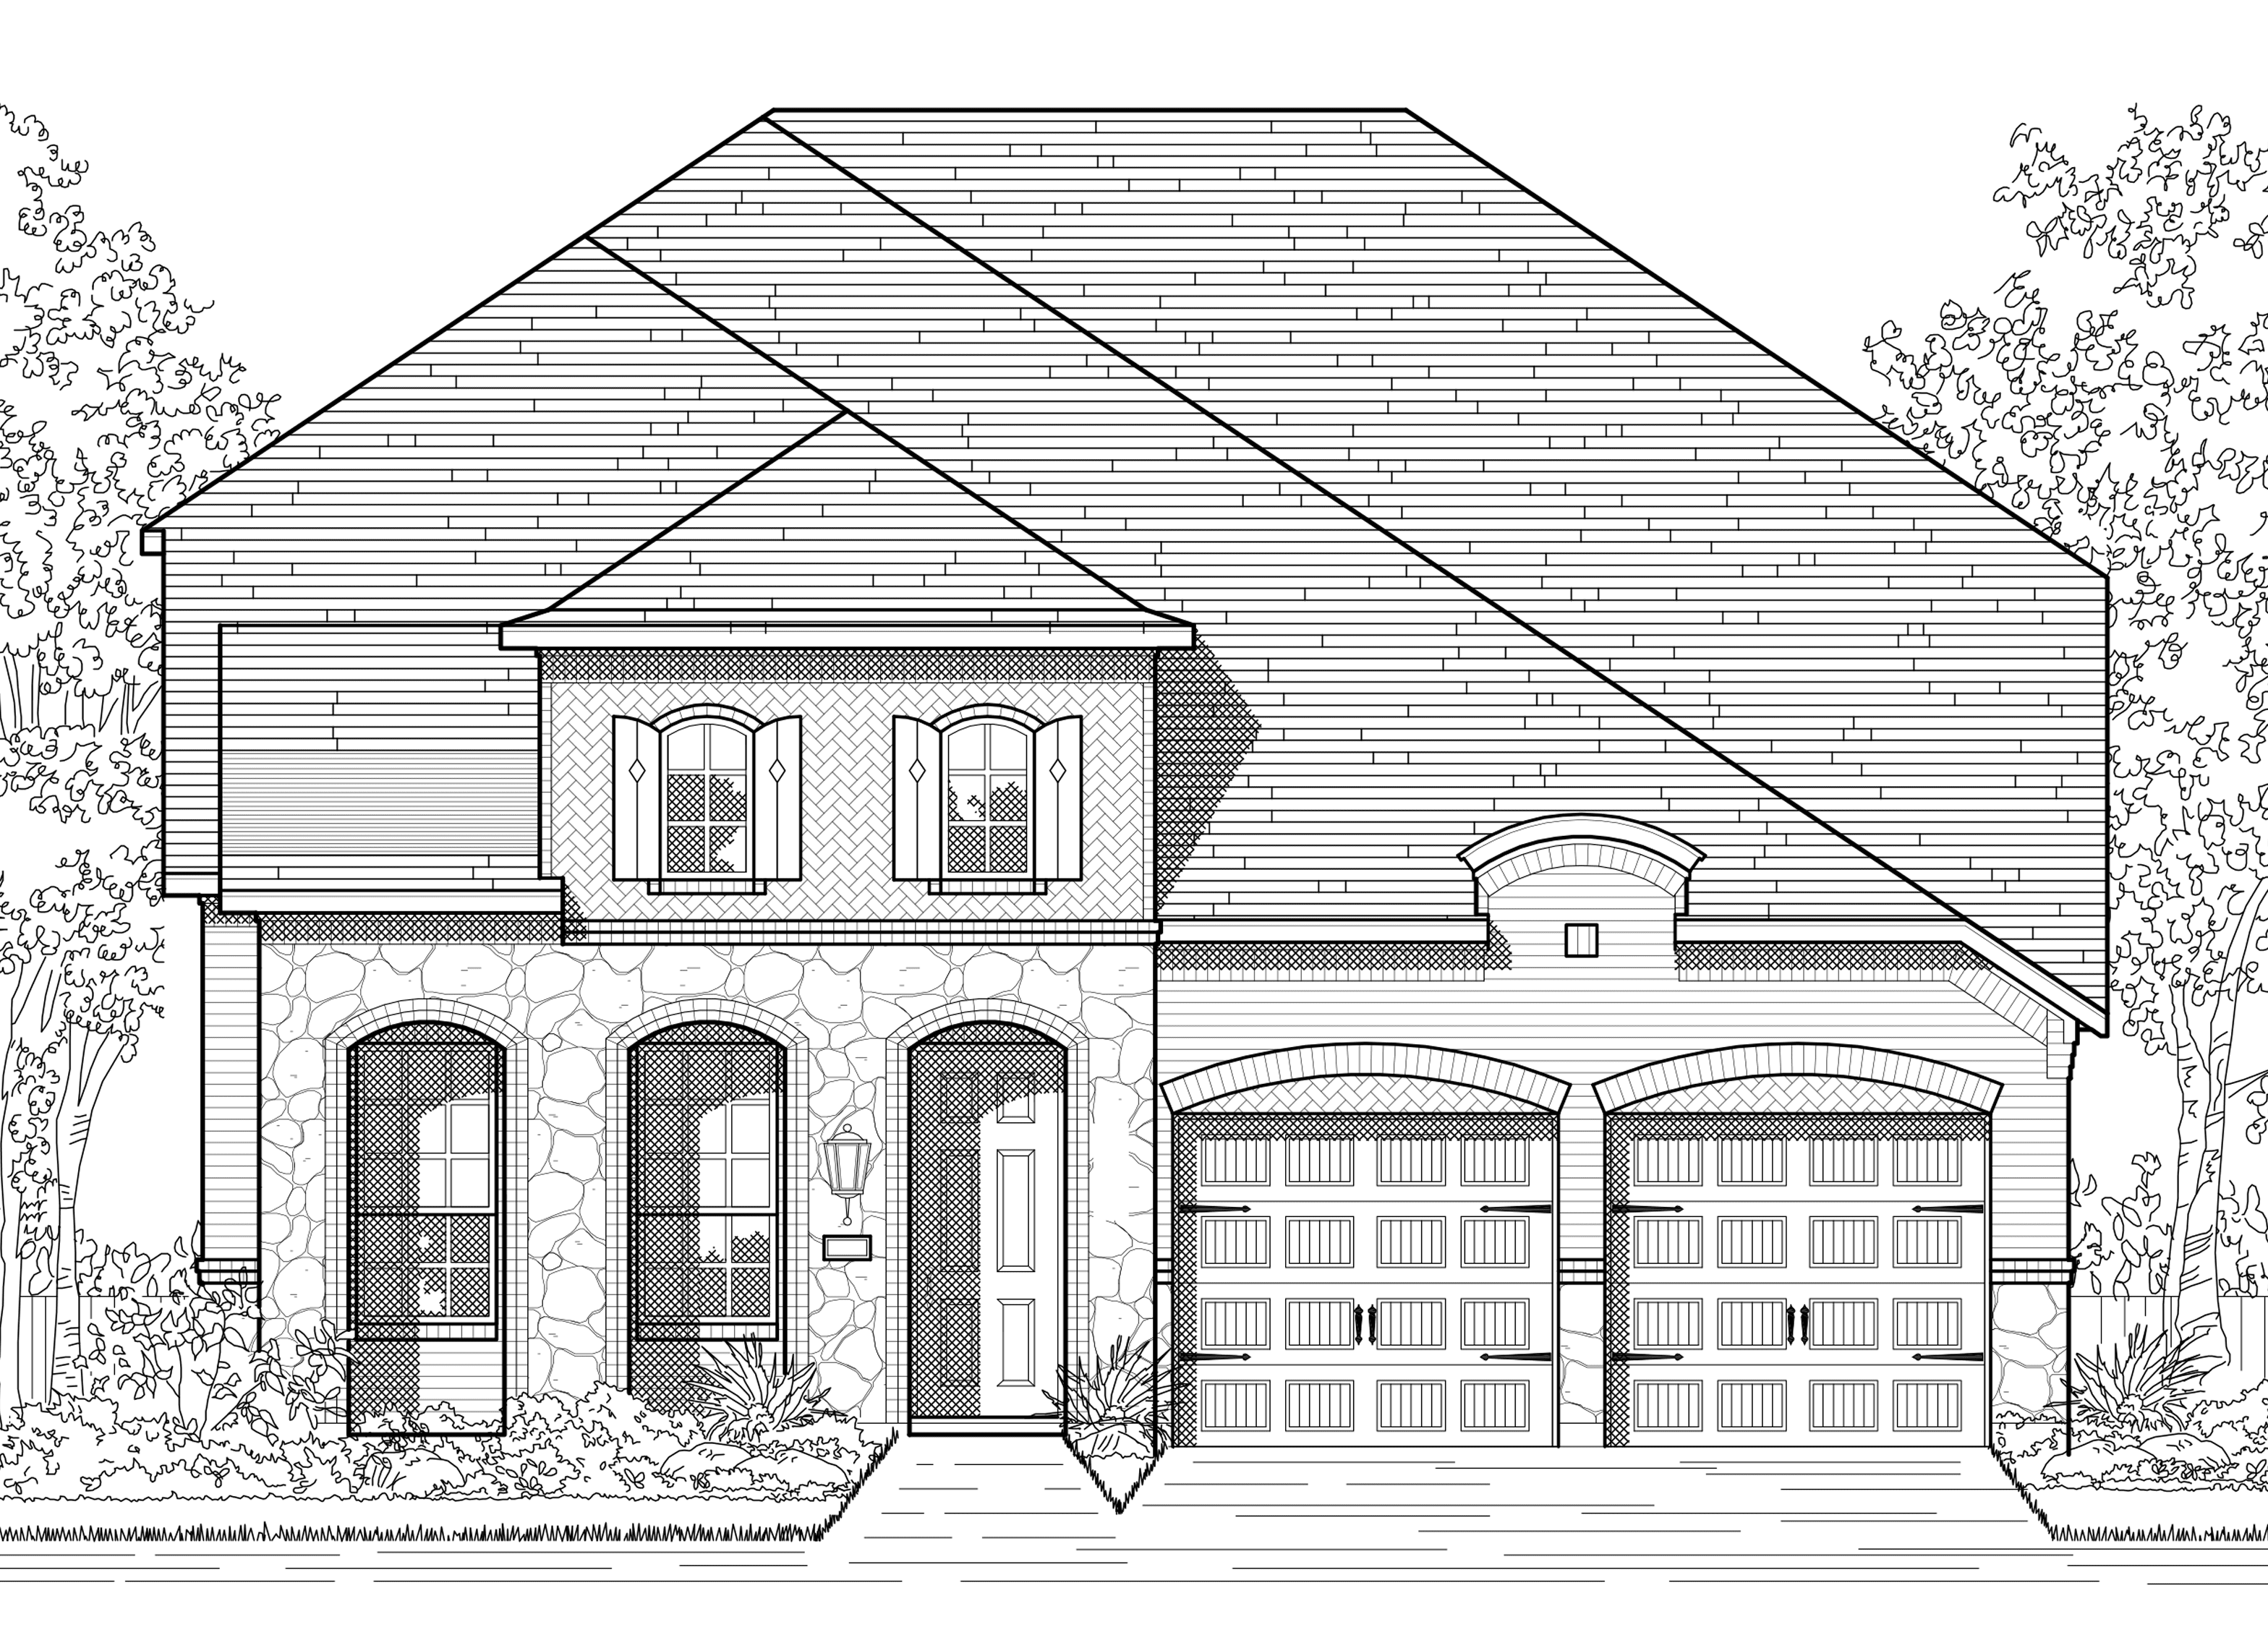 Highland Homes Cross Creek Ranch Cross Creek Ranch 55s Plan 559 1377503 Fulshear Tx New